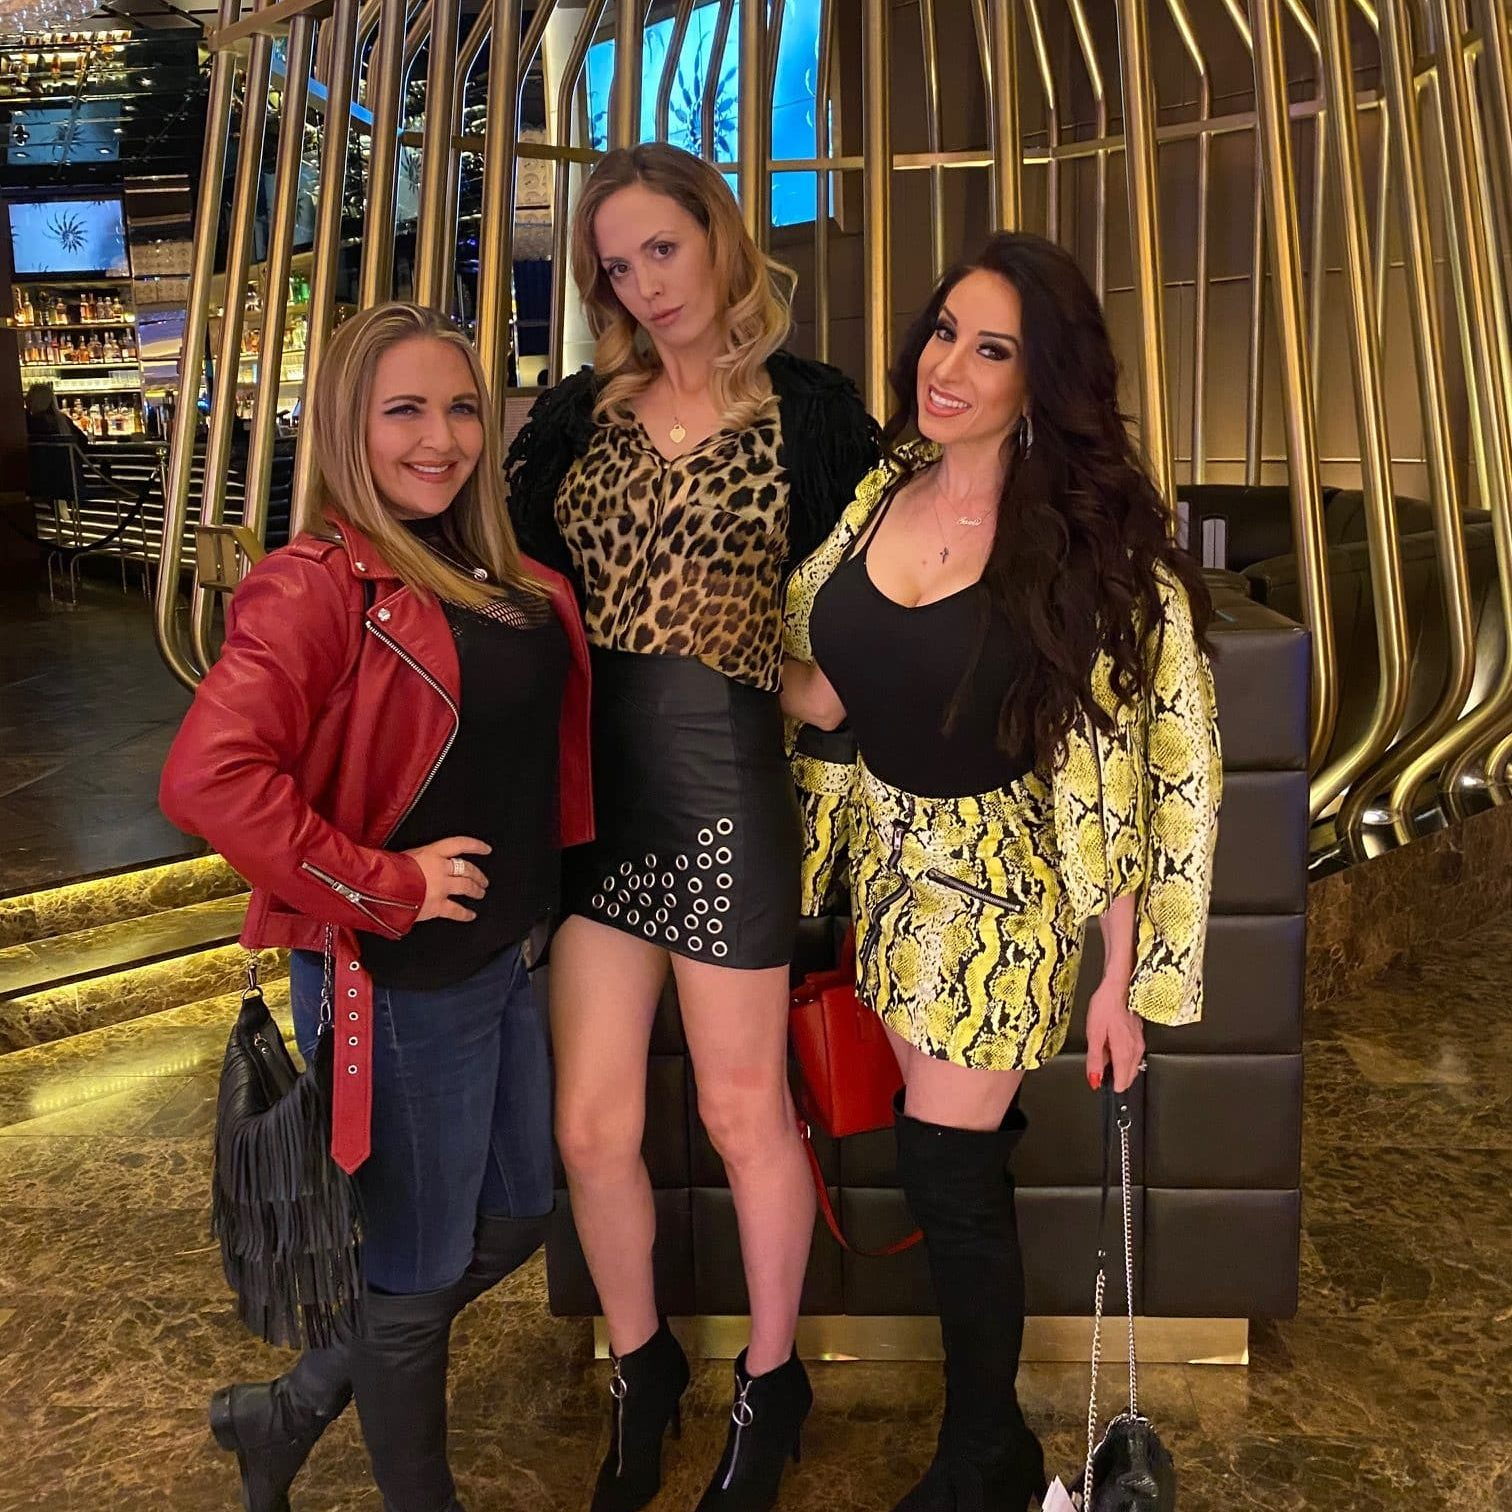 Amanda Stanely The Hair Standard Las Vegas friends